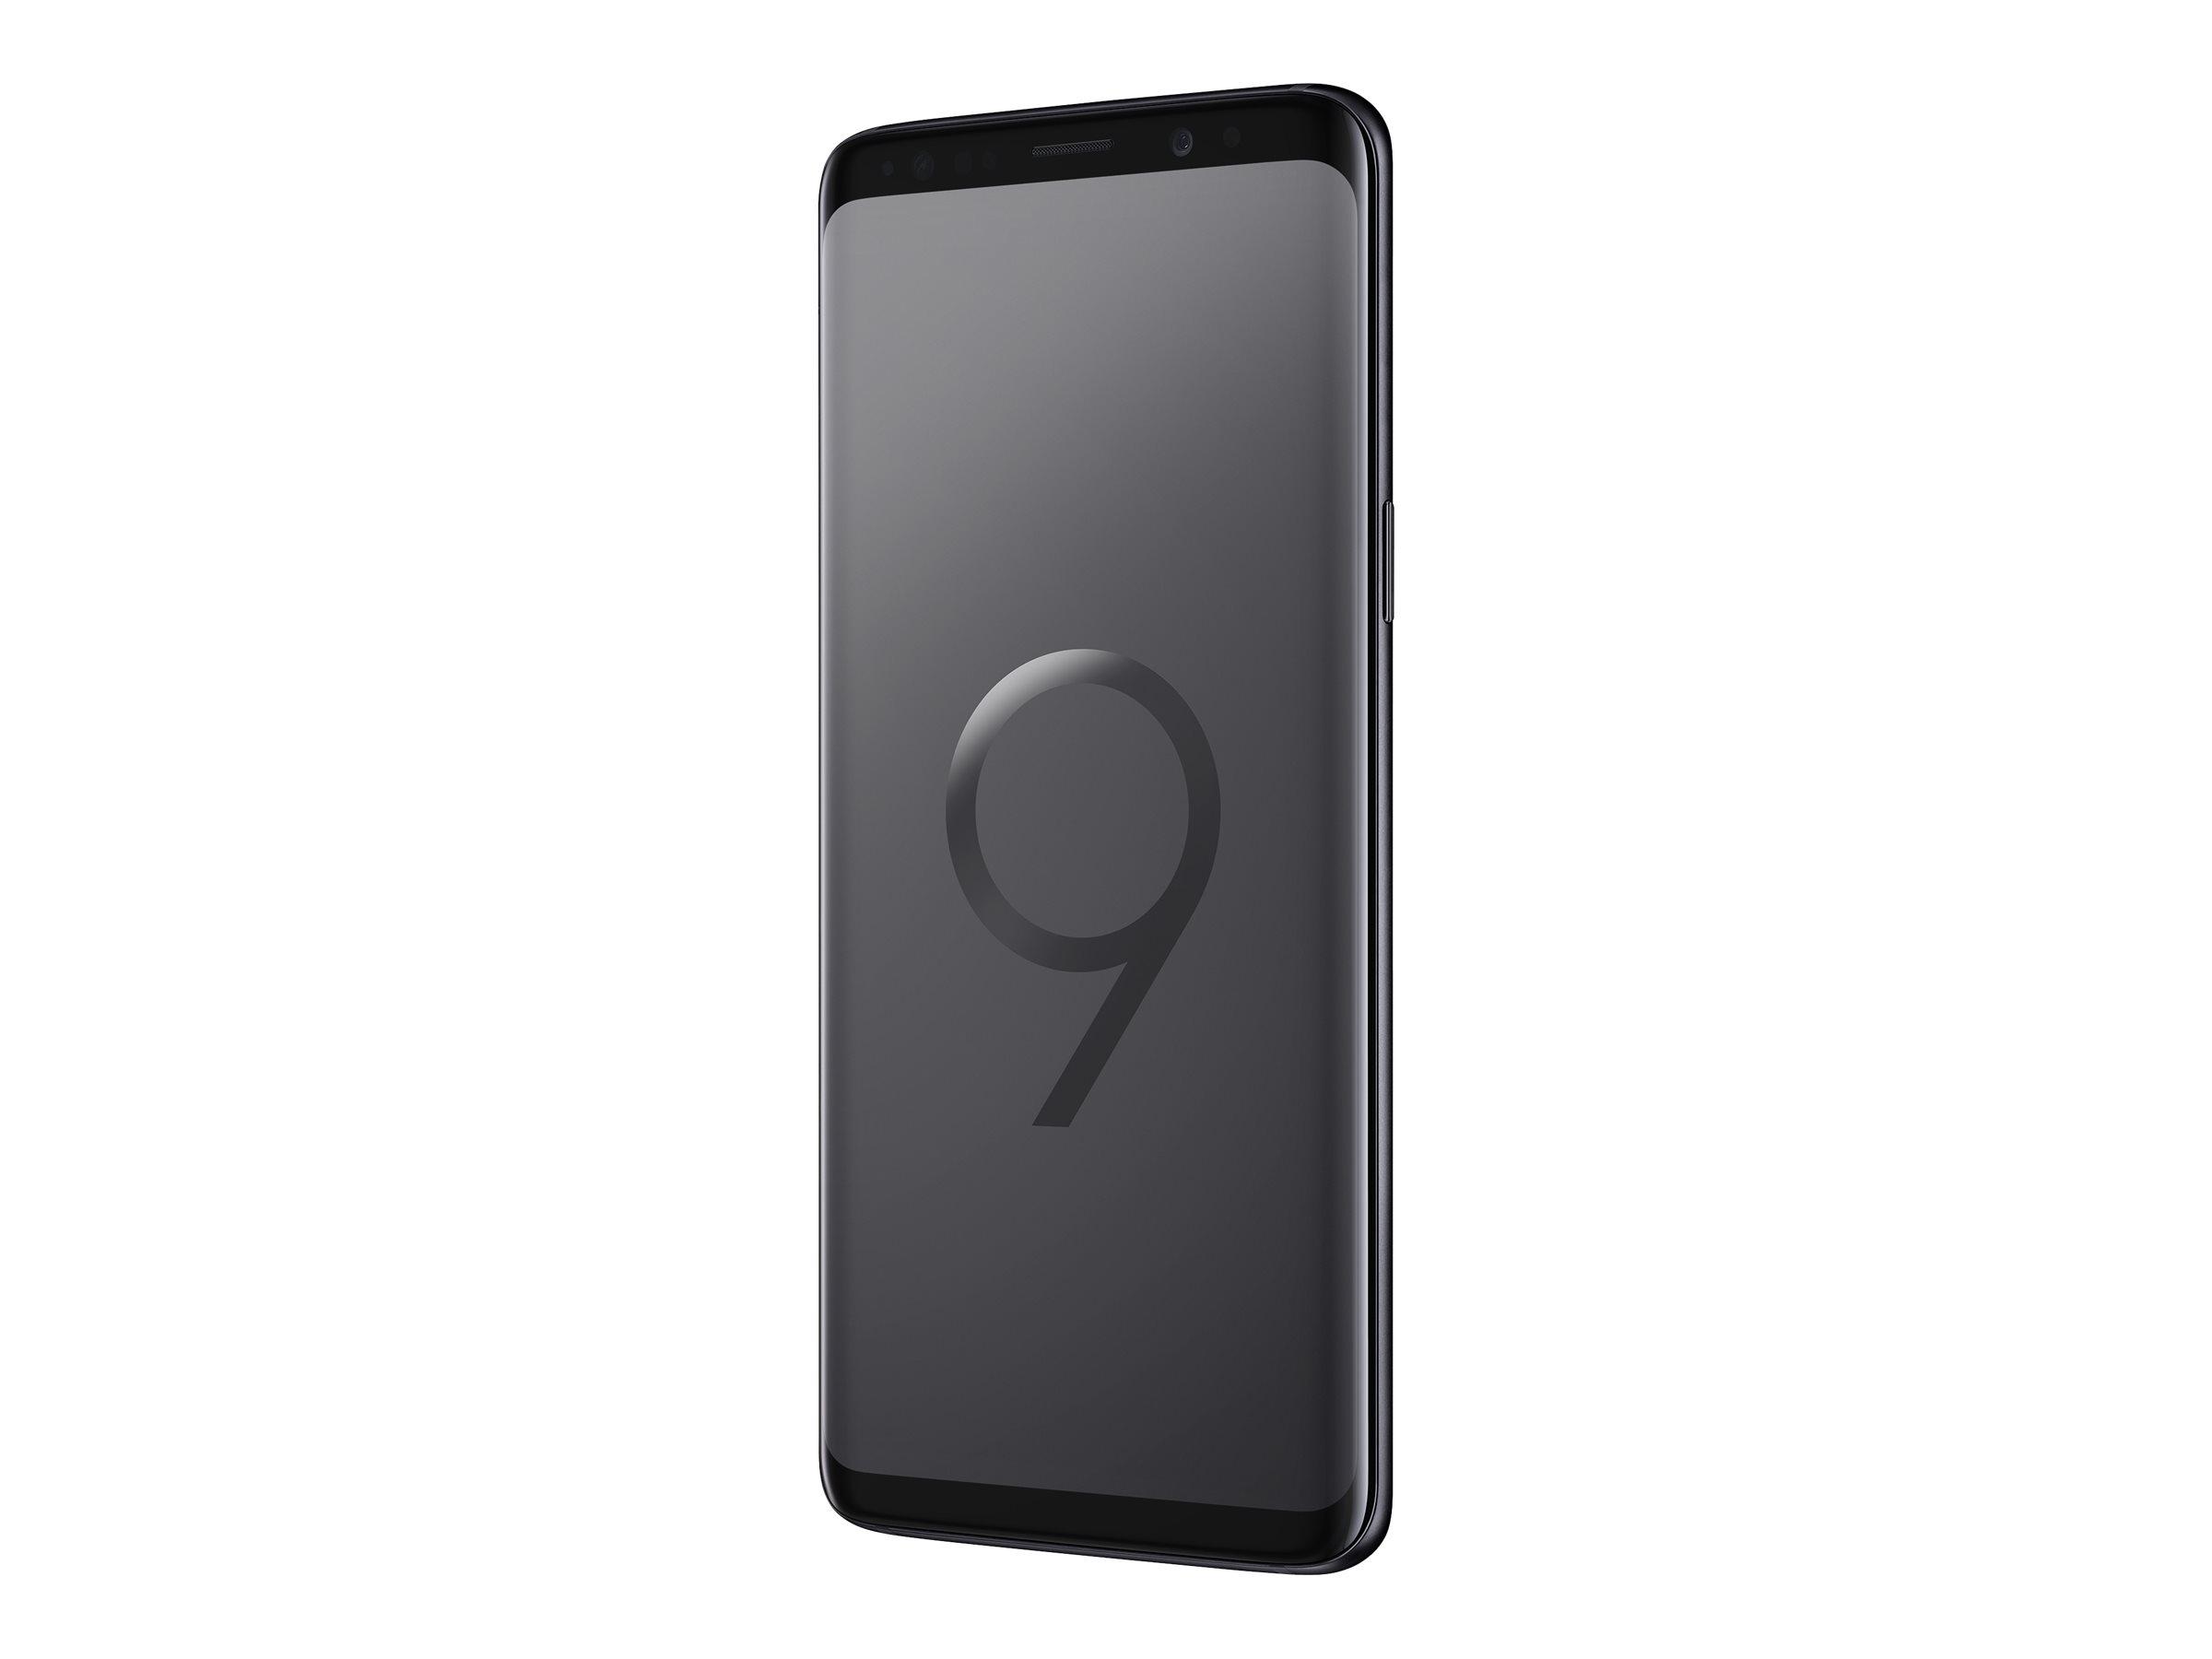 Samsung Galaxy S9 - SM-G960F/DS - Smartphone - Dual-SIM - 4G LTE - 64 GB